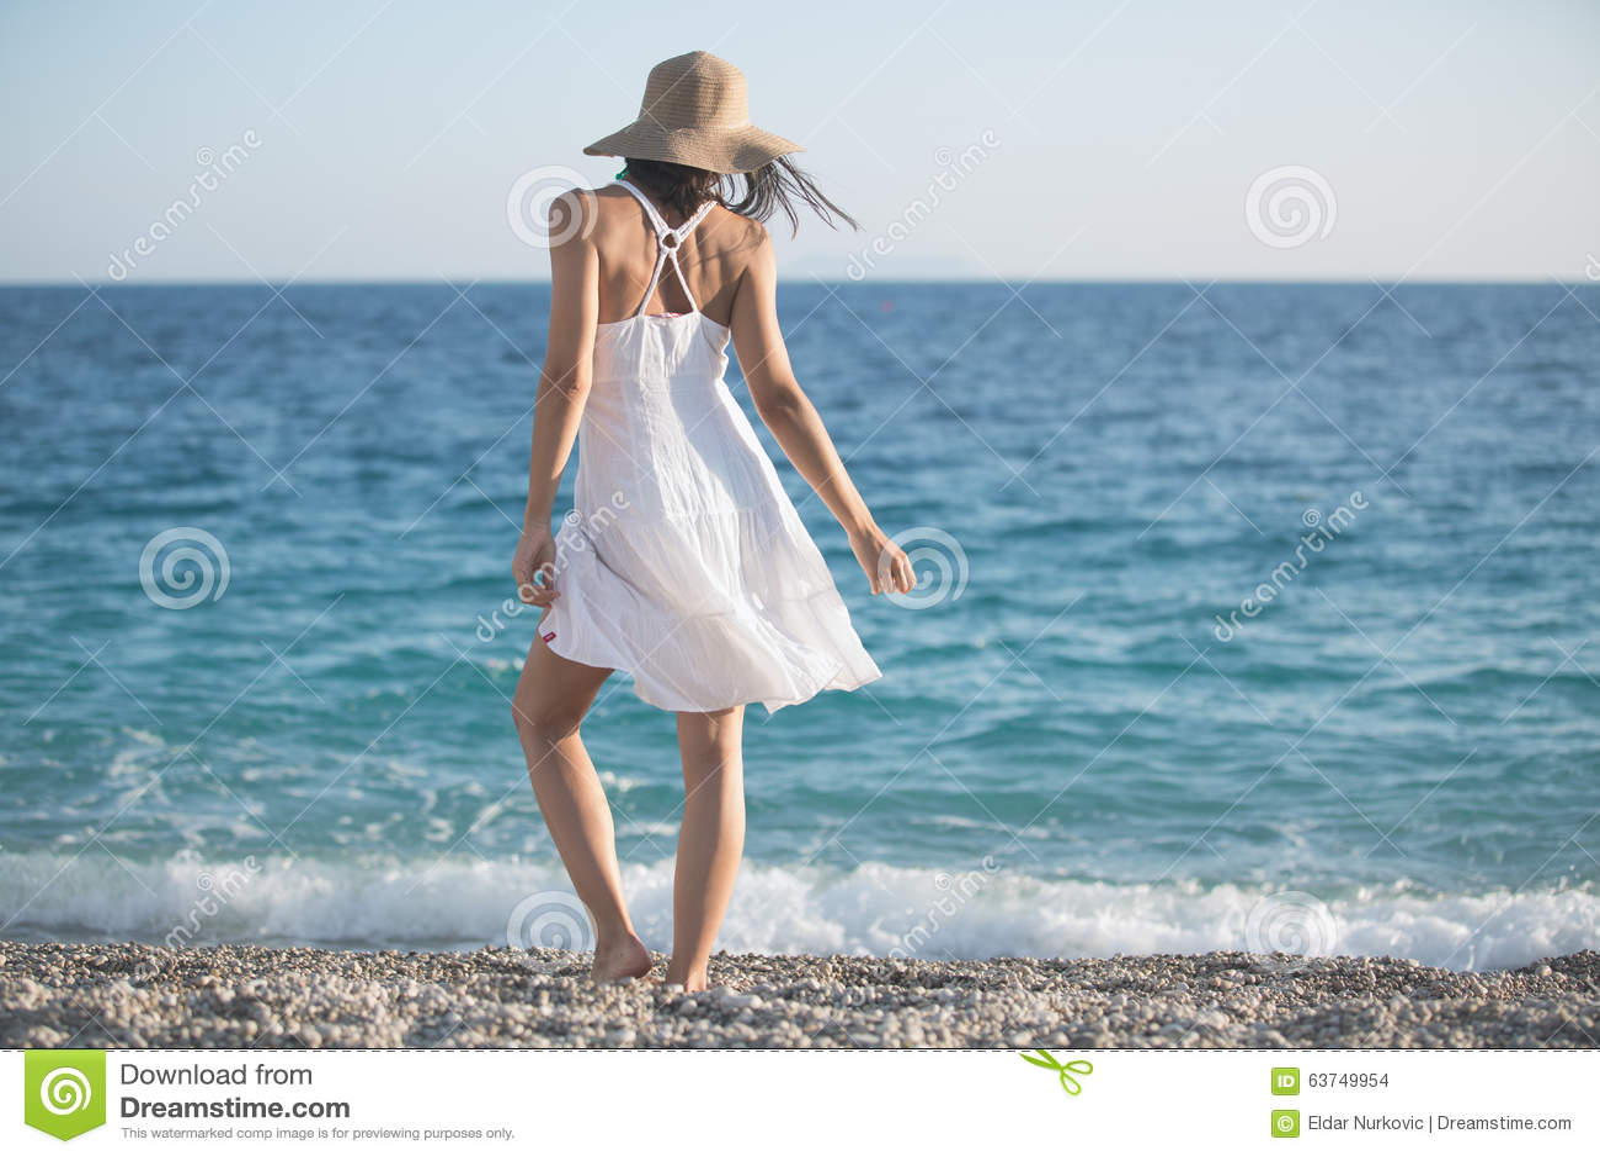 beach body naked women